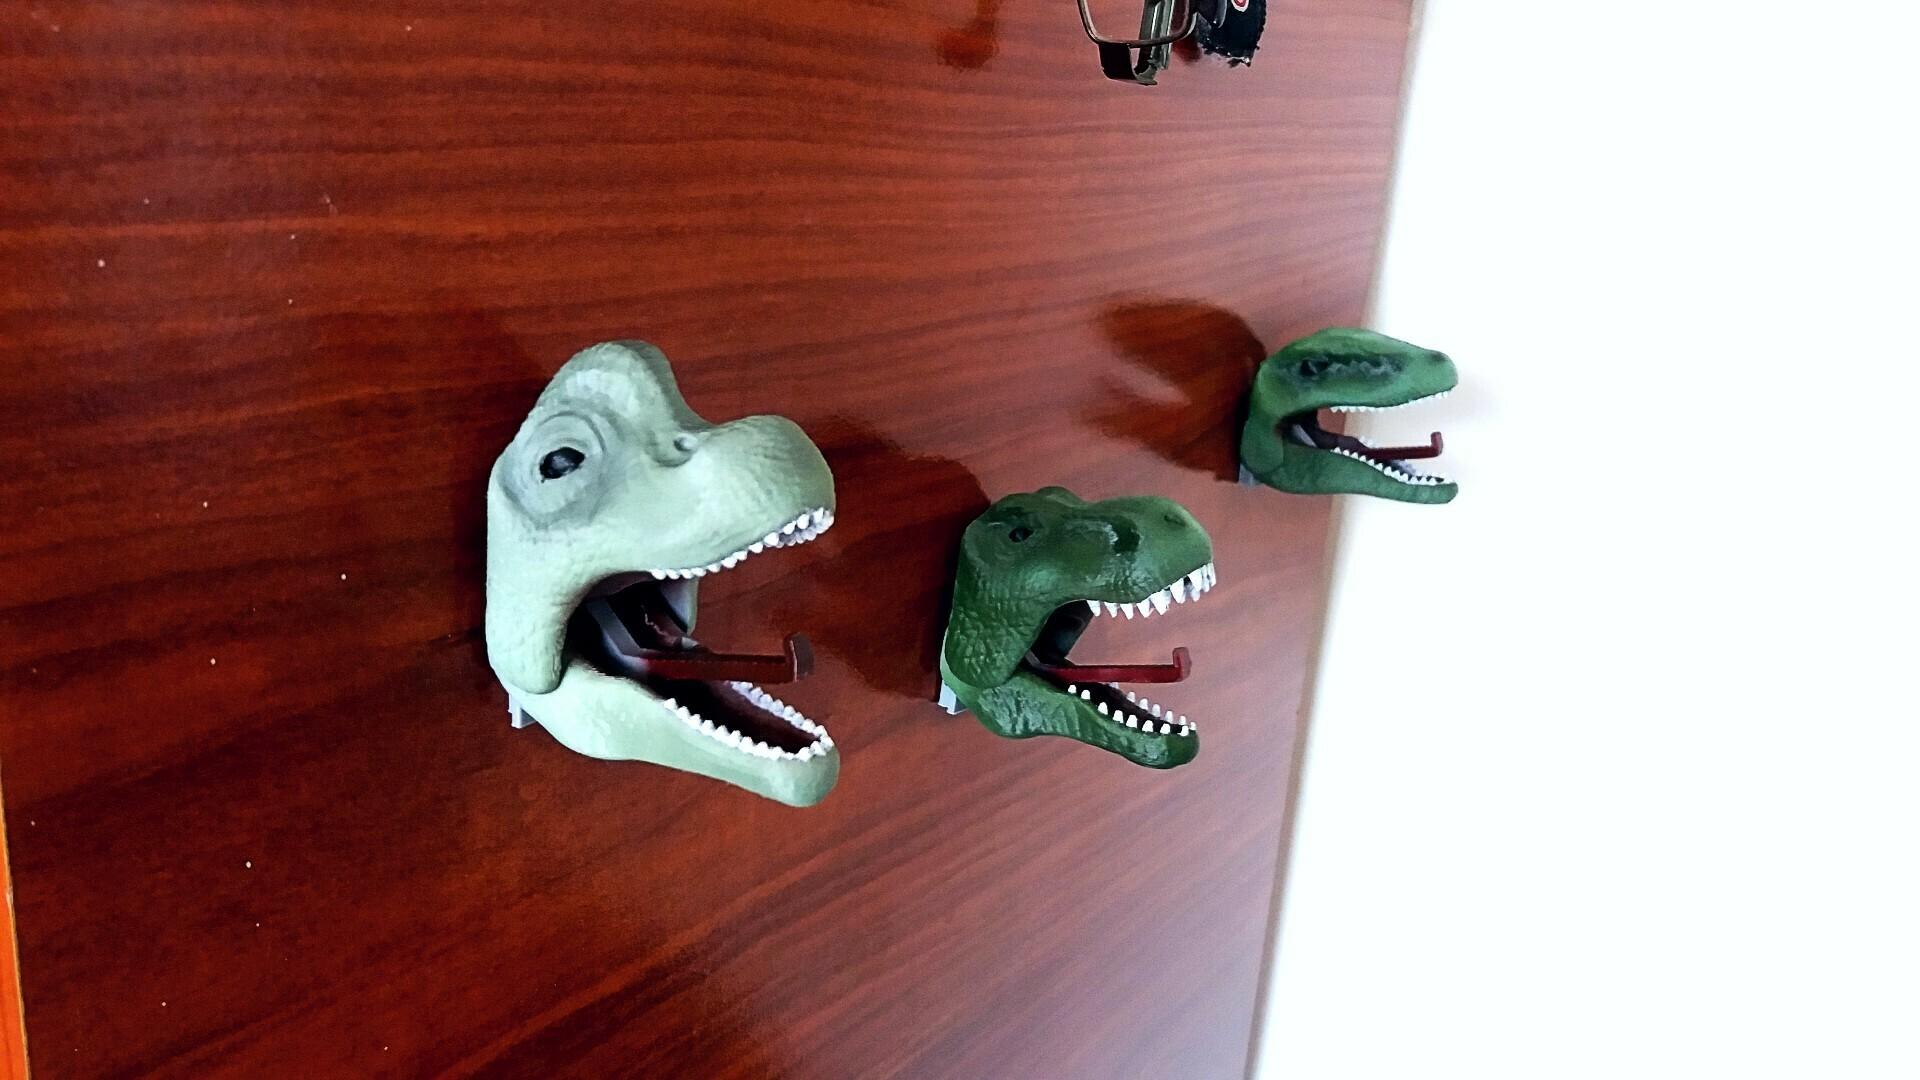 5 foto dinos.jpg Télécharger fichier STL Pendre les dinosaures • Objet à imprimer en 3D, Aslan3d